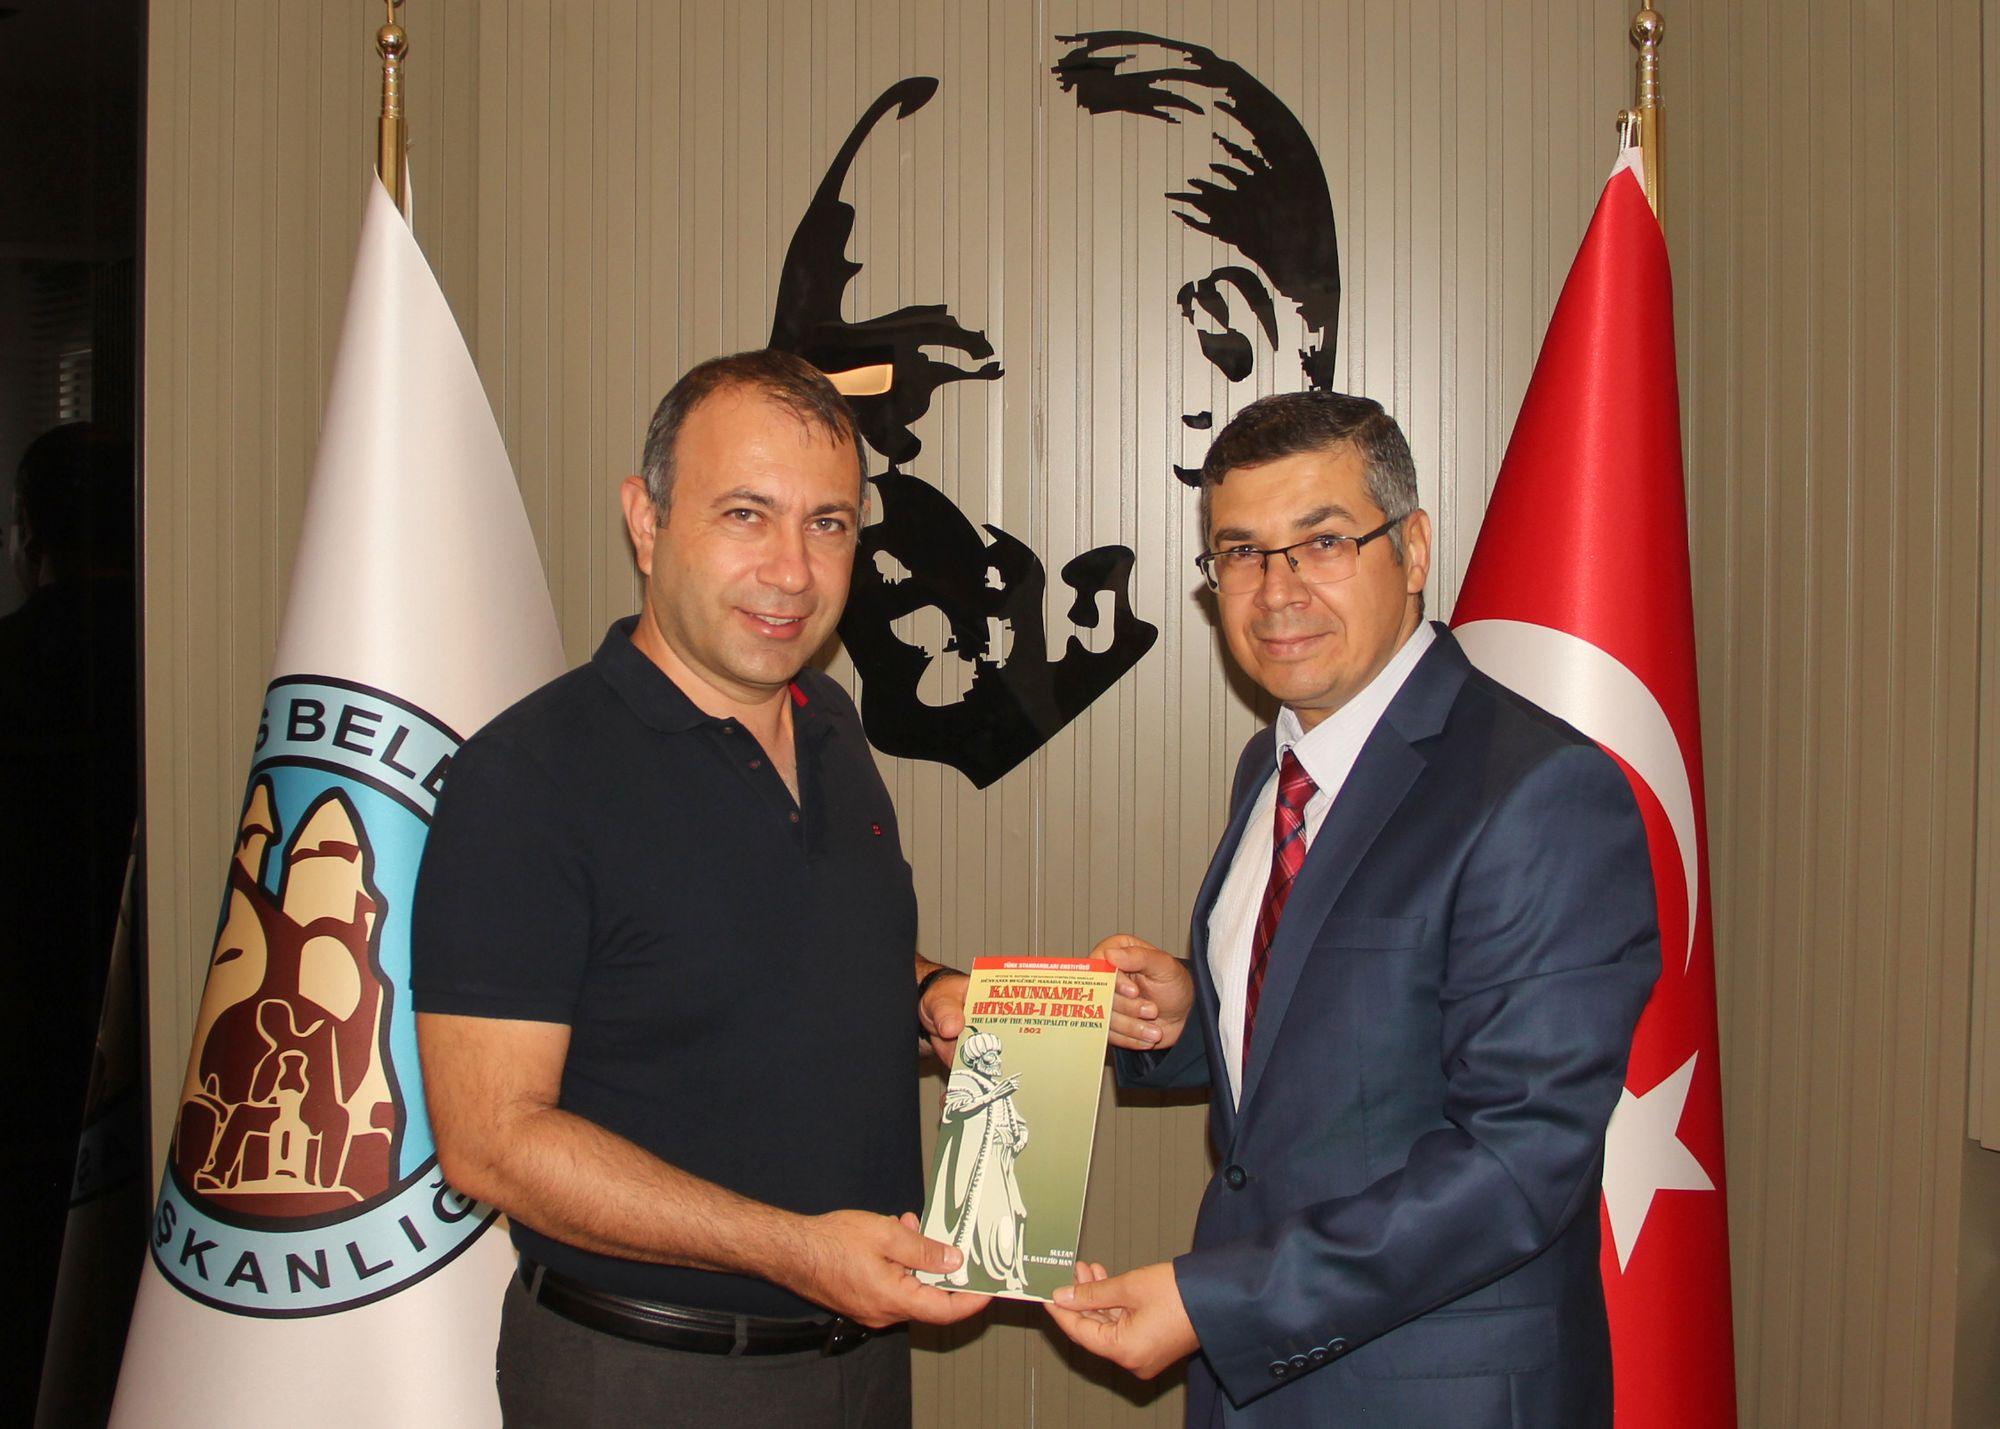 TSE Nevşehir İl Müdürü Şahiner Başkan İbaş'ı Ziyaret Etti.